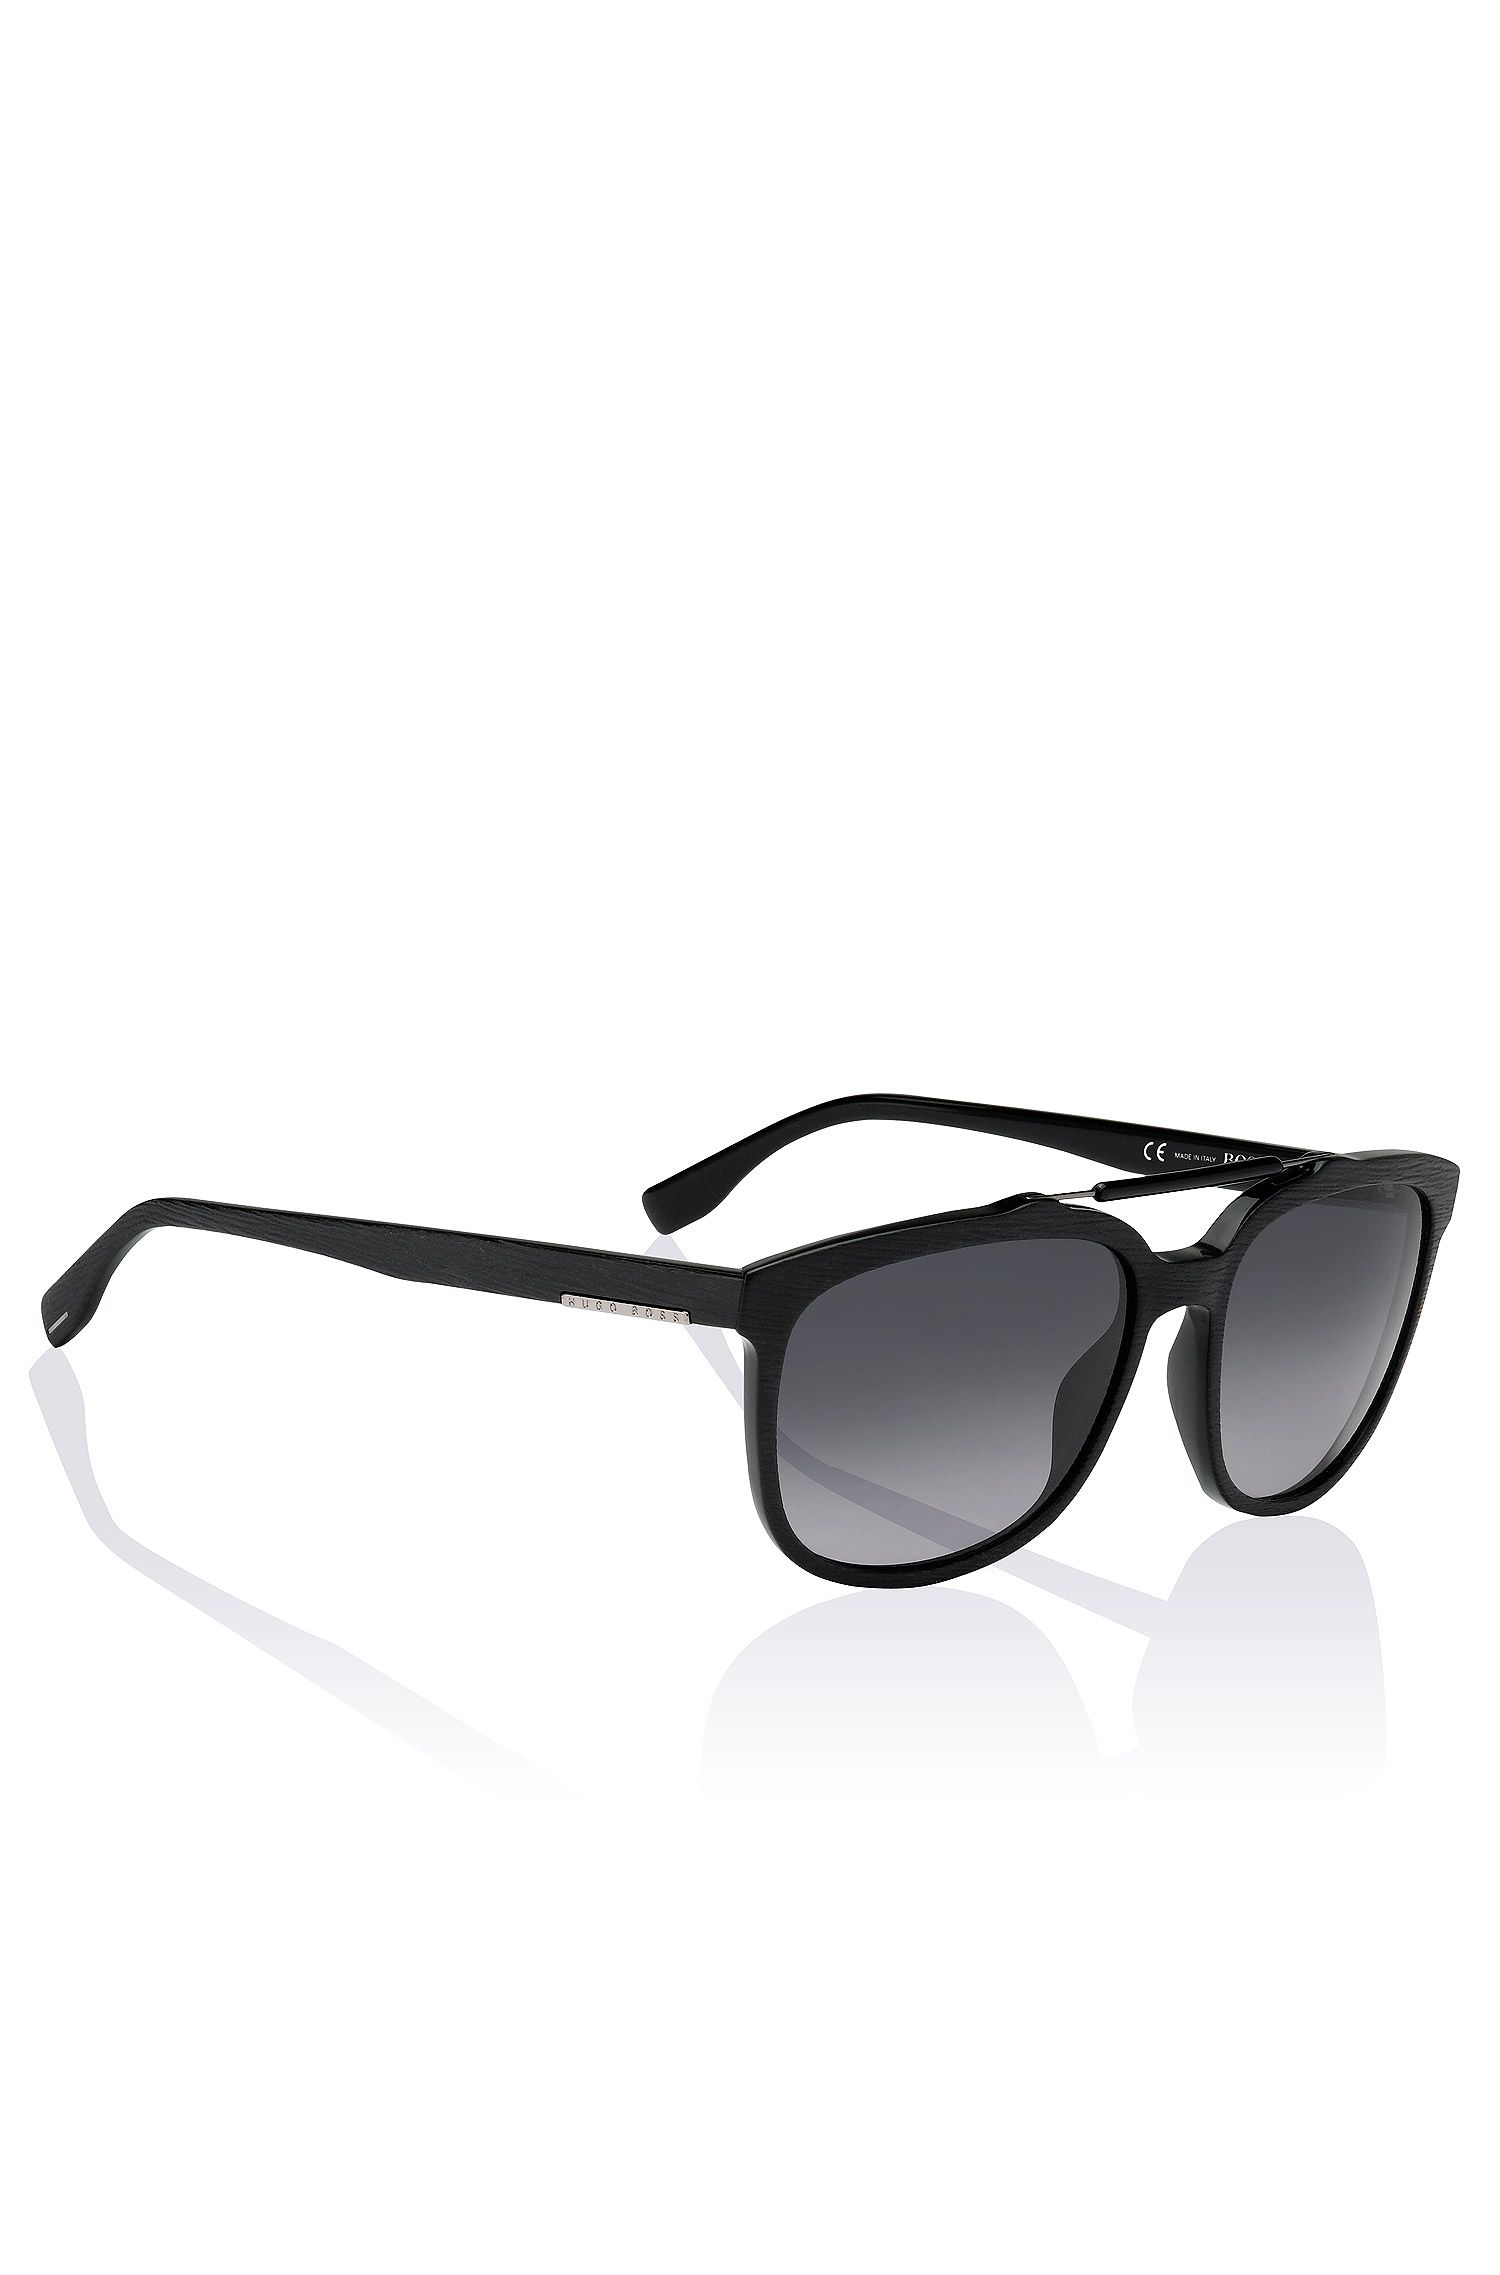 Sonnenbrille ´BOSS 0636/S` aus Acetat, Assorted-Pre-Pack